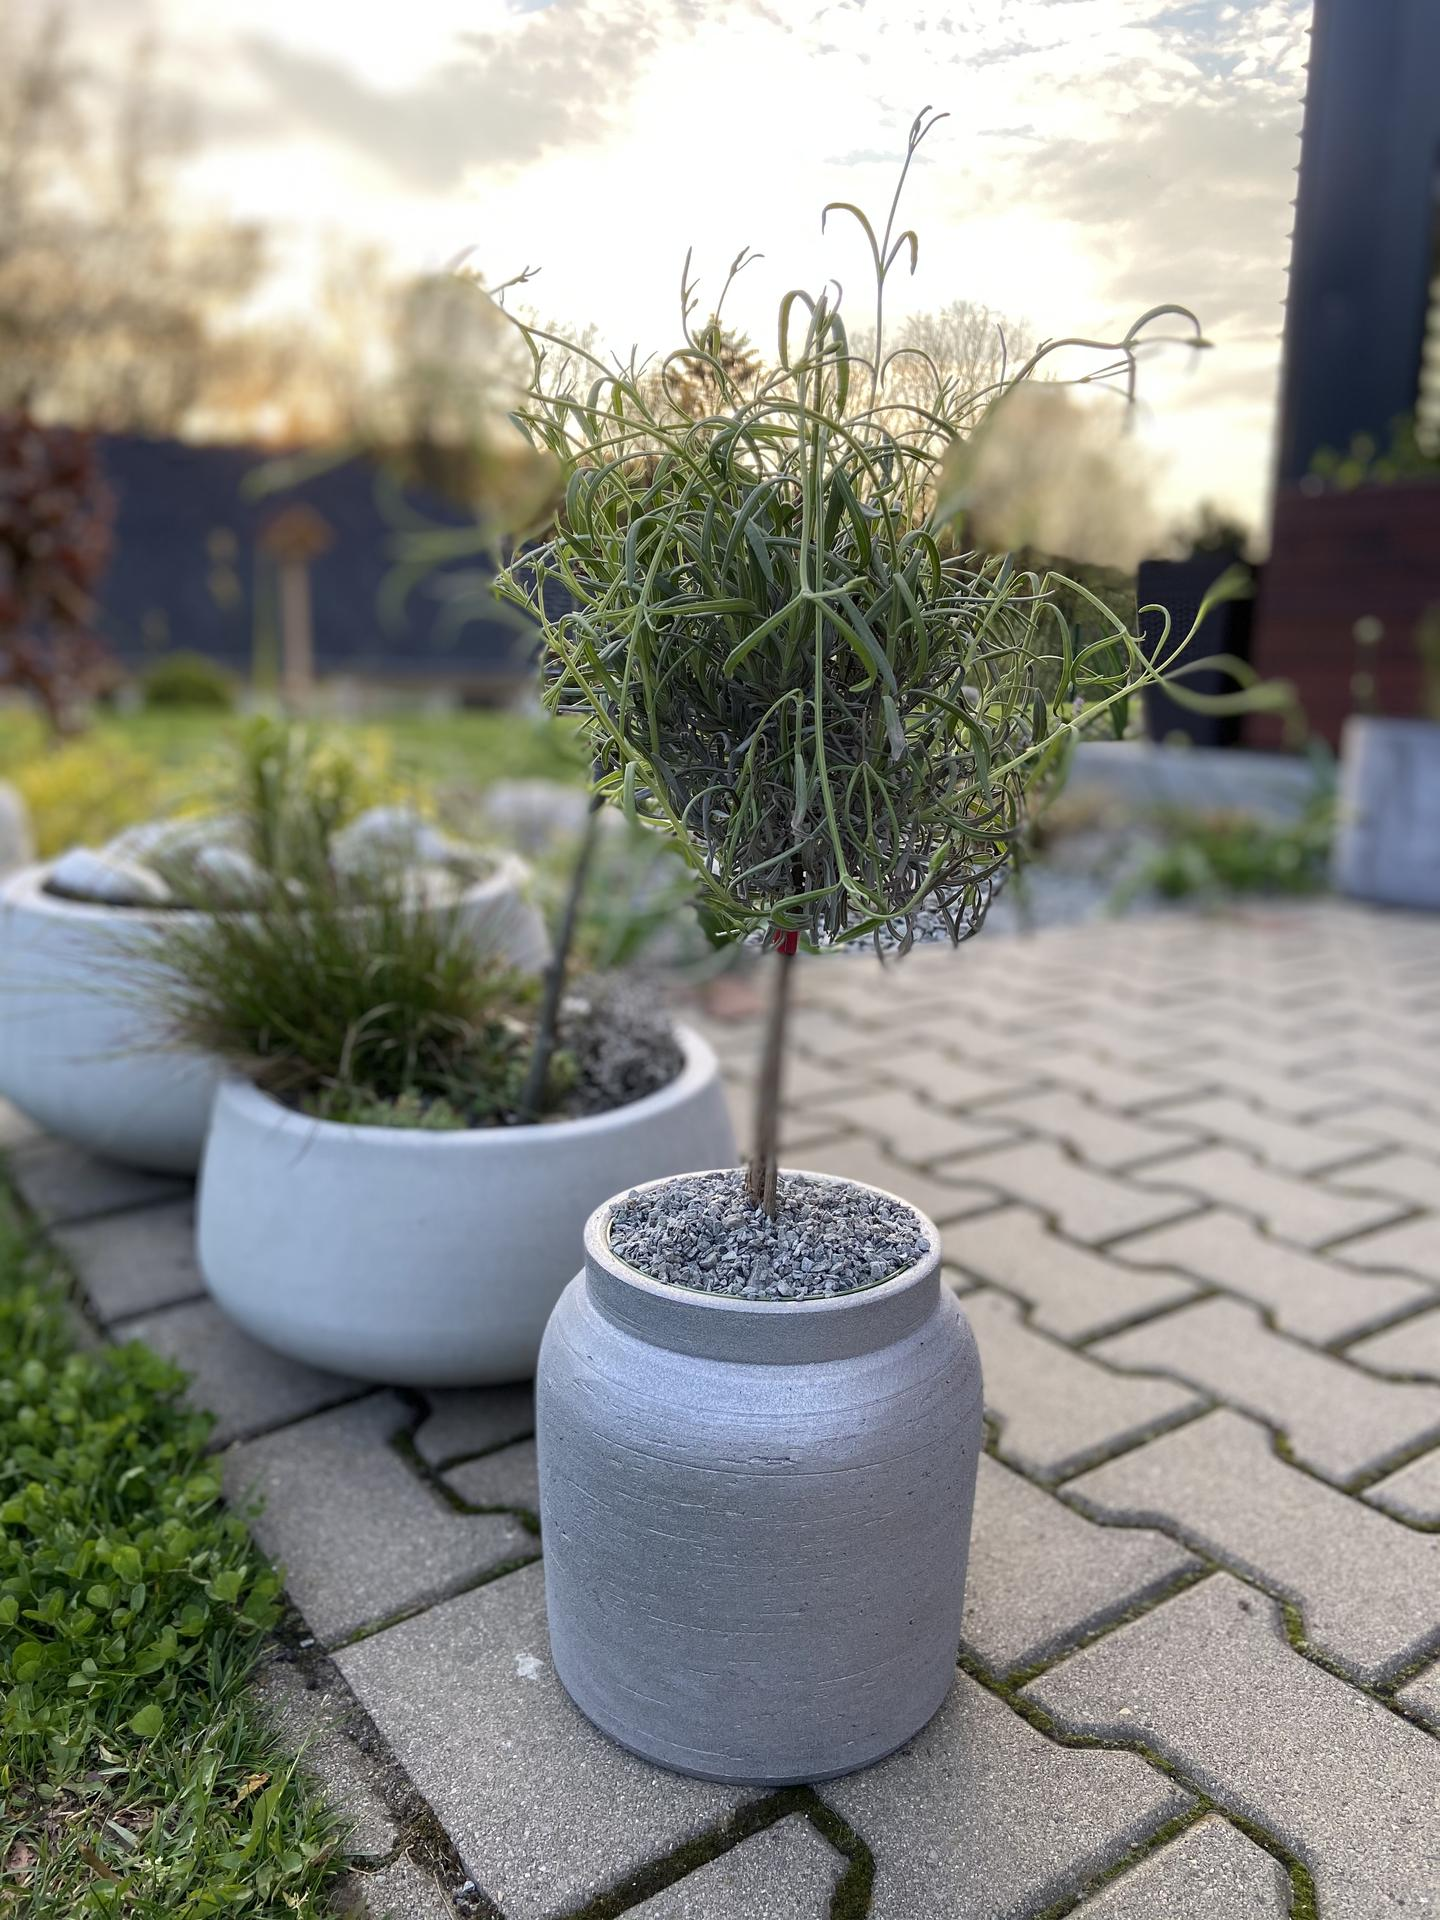 Pergola + zimní zahrada + zahrada - levandule na kmínku